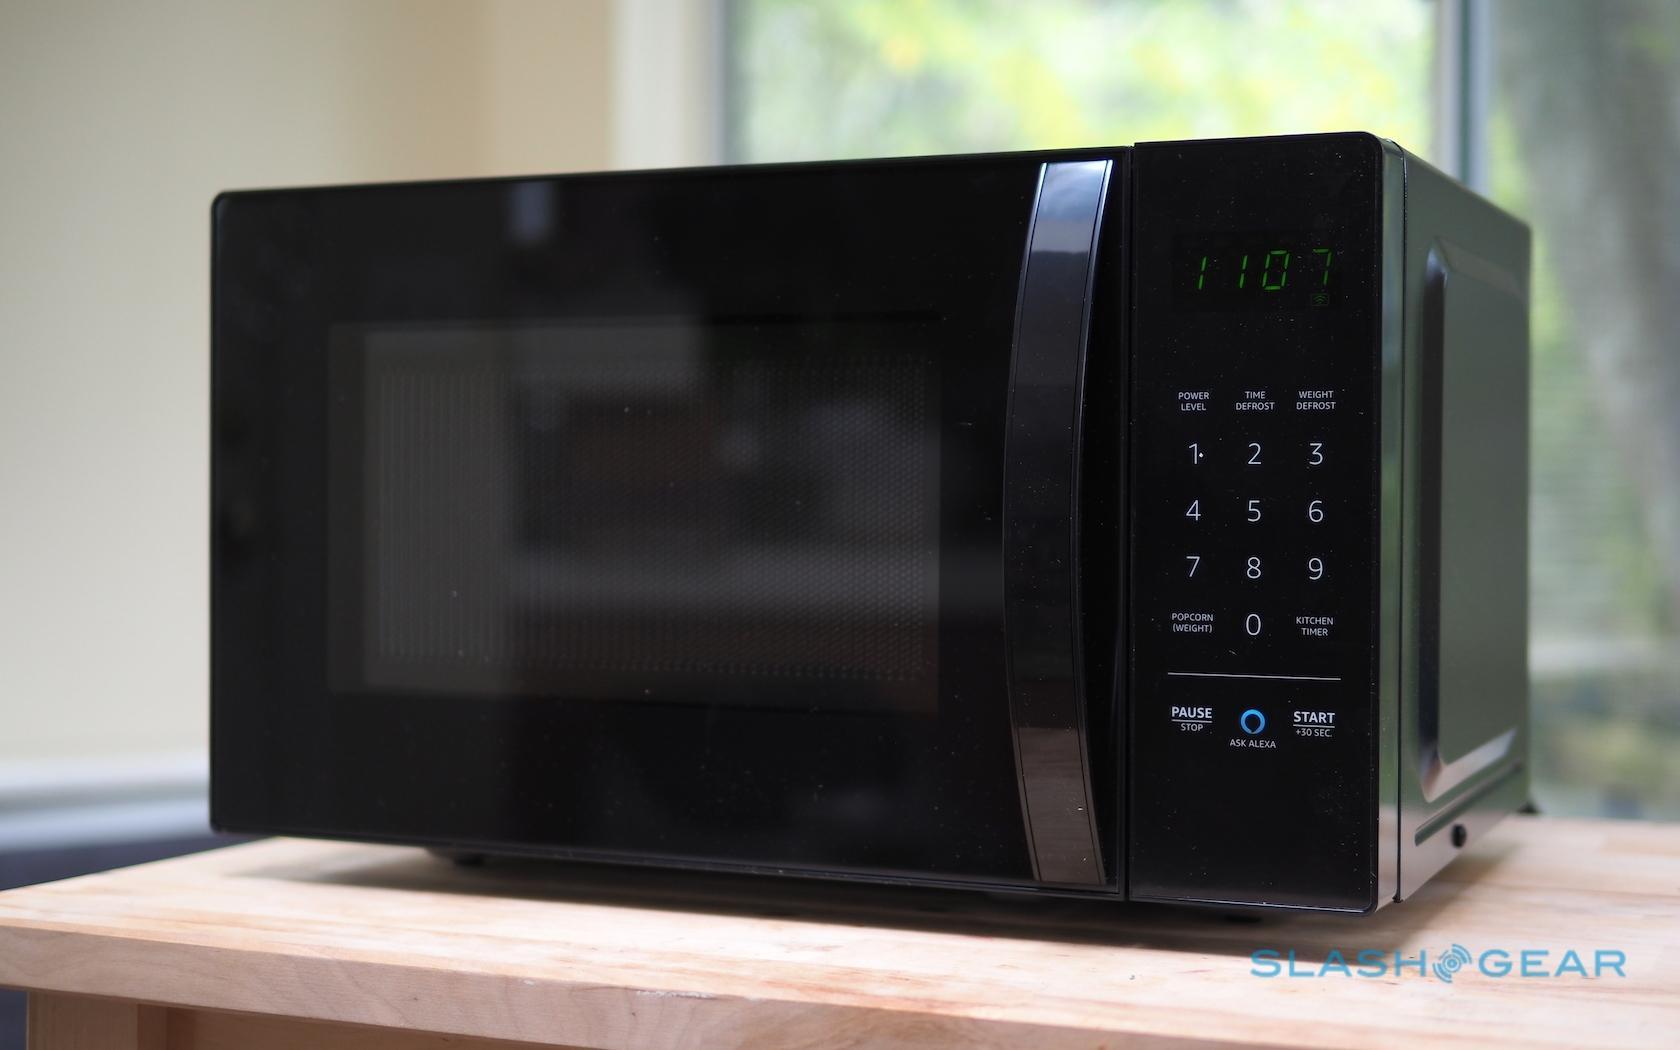 The Amazon smart microwave is an Alexa Trojan horse - SlashGear